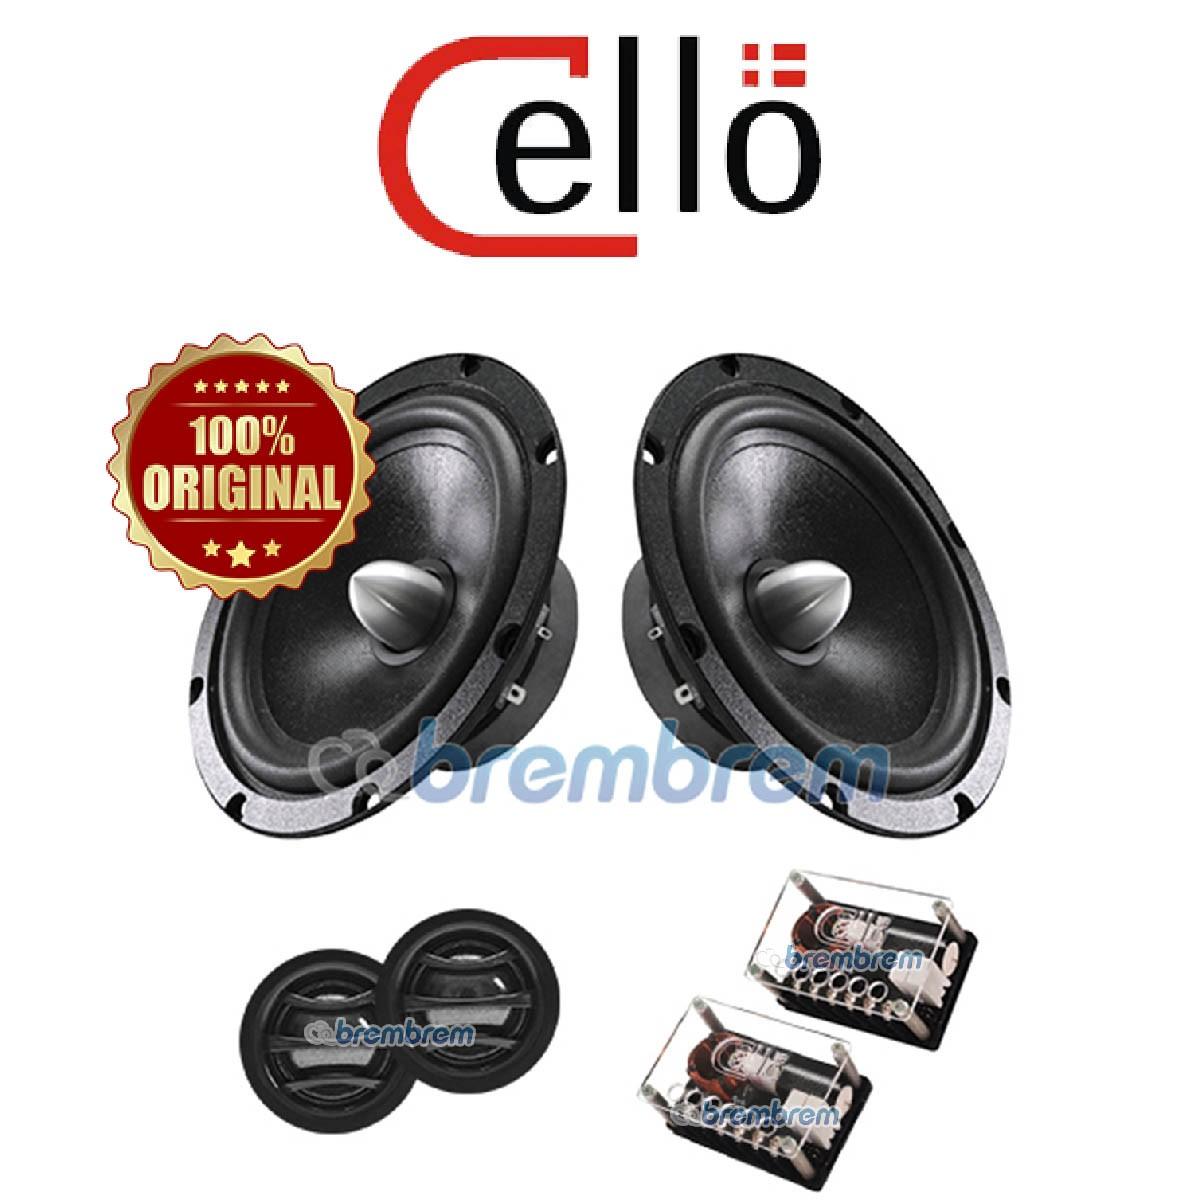 CELLO CLASSIC 1 - SPEAKER 2 WAY